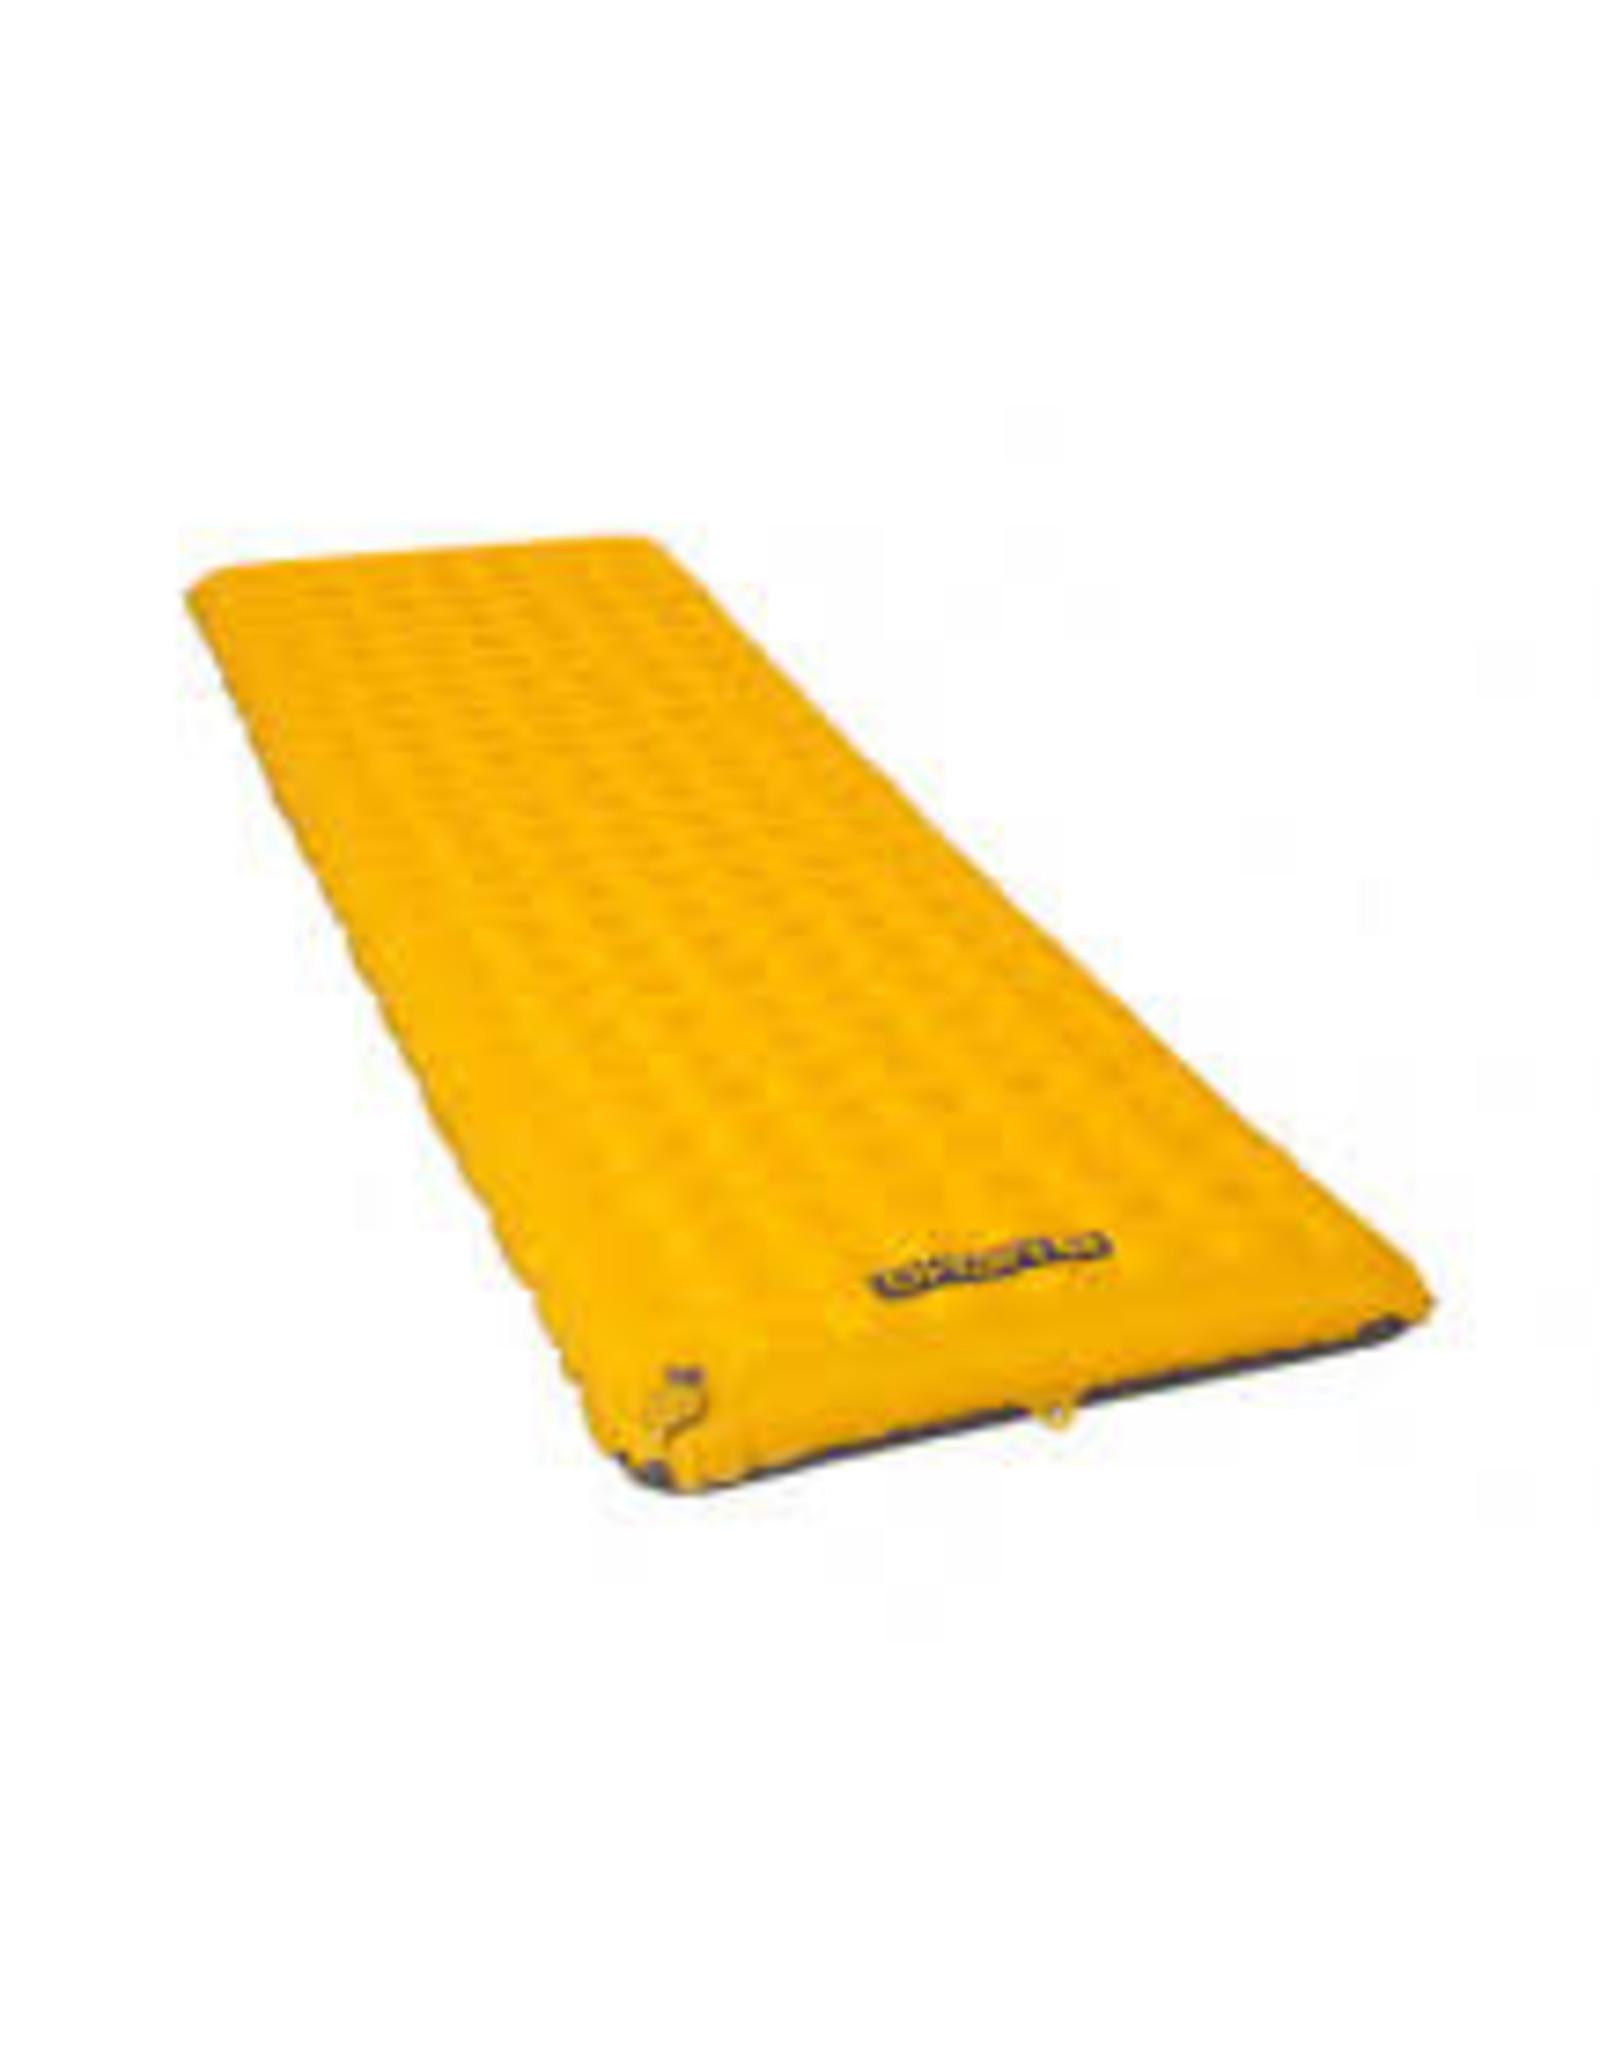 NEMO Tensor Ultralight Sleeping Pad